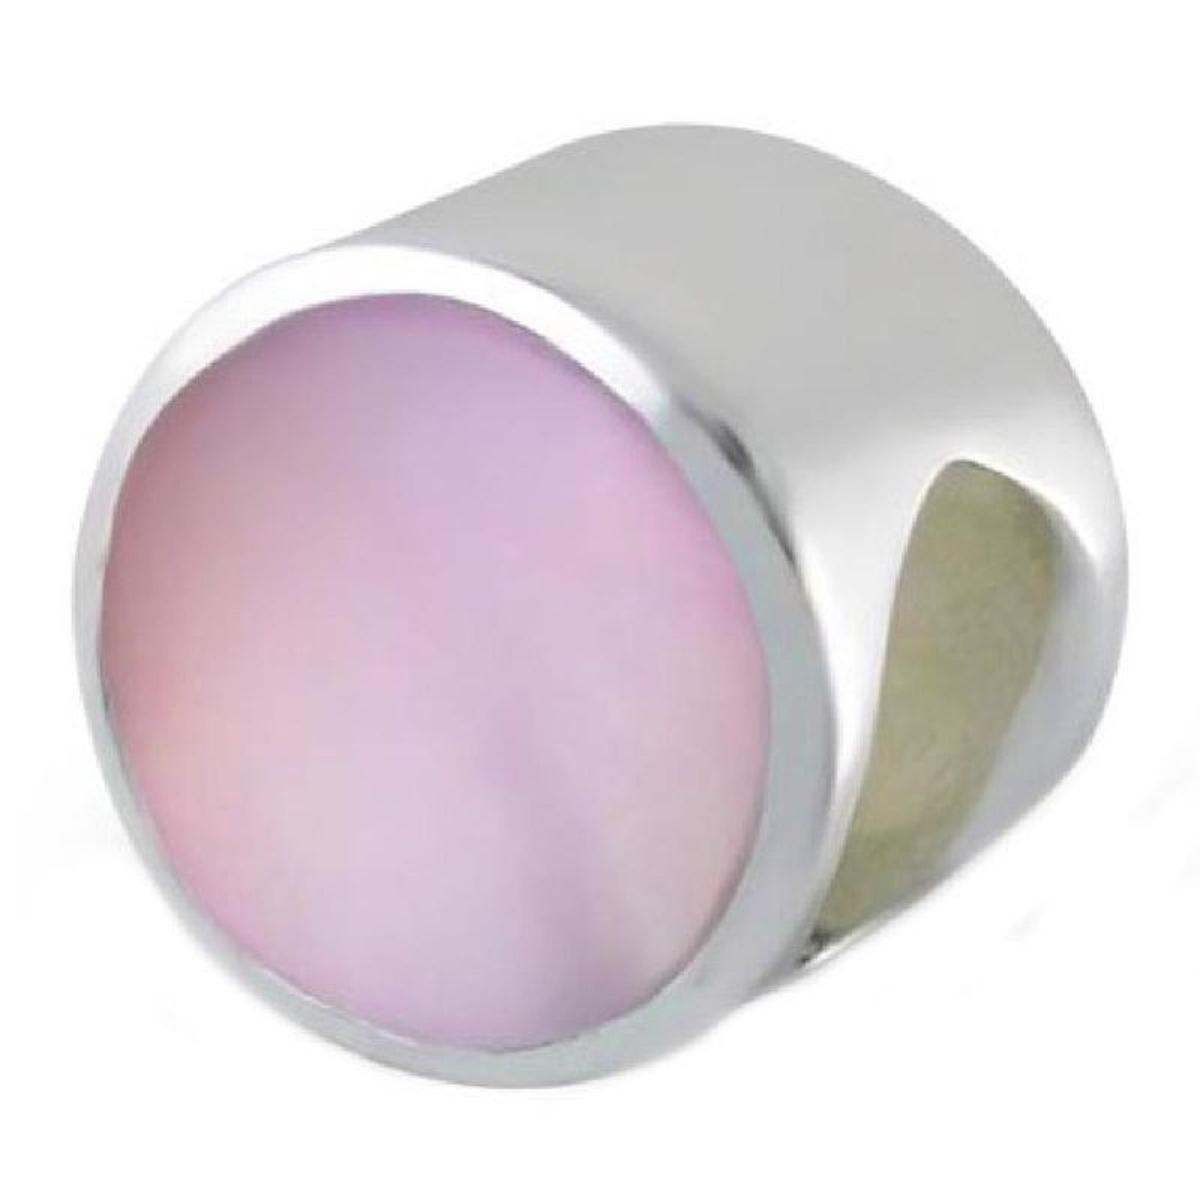 Charm Perle Disque Nacre Rose Argent 925 - Compatible Pandora, Trollbeads, Chamilia, Biagi